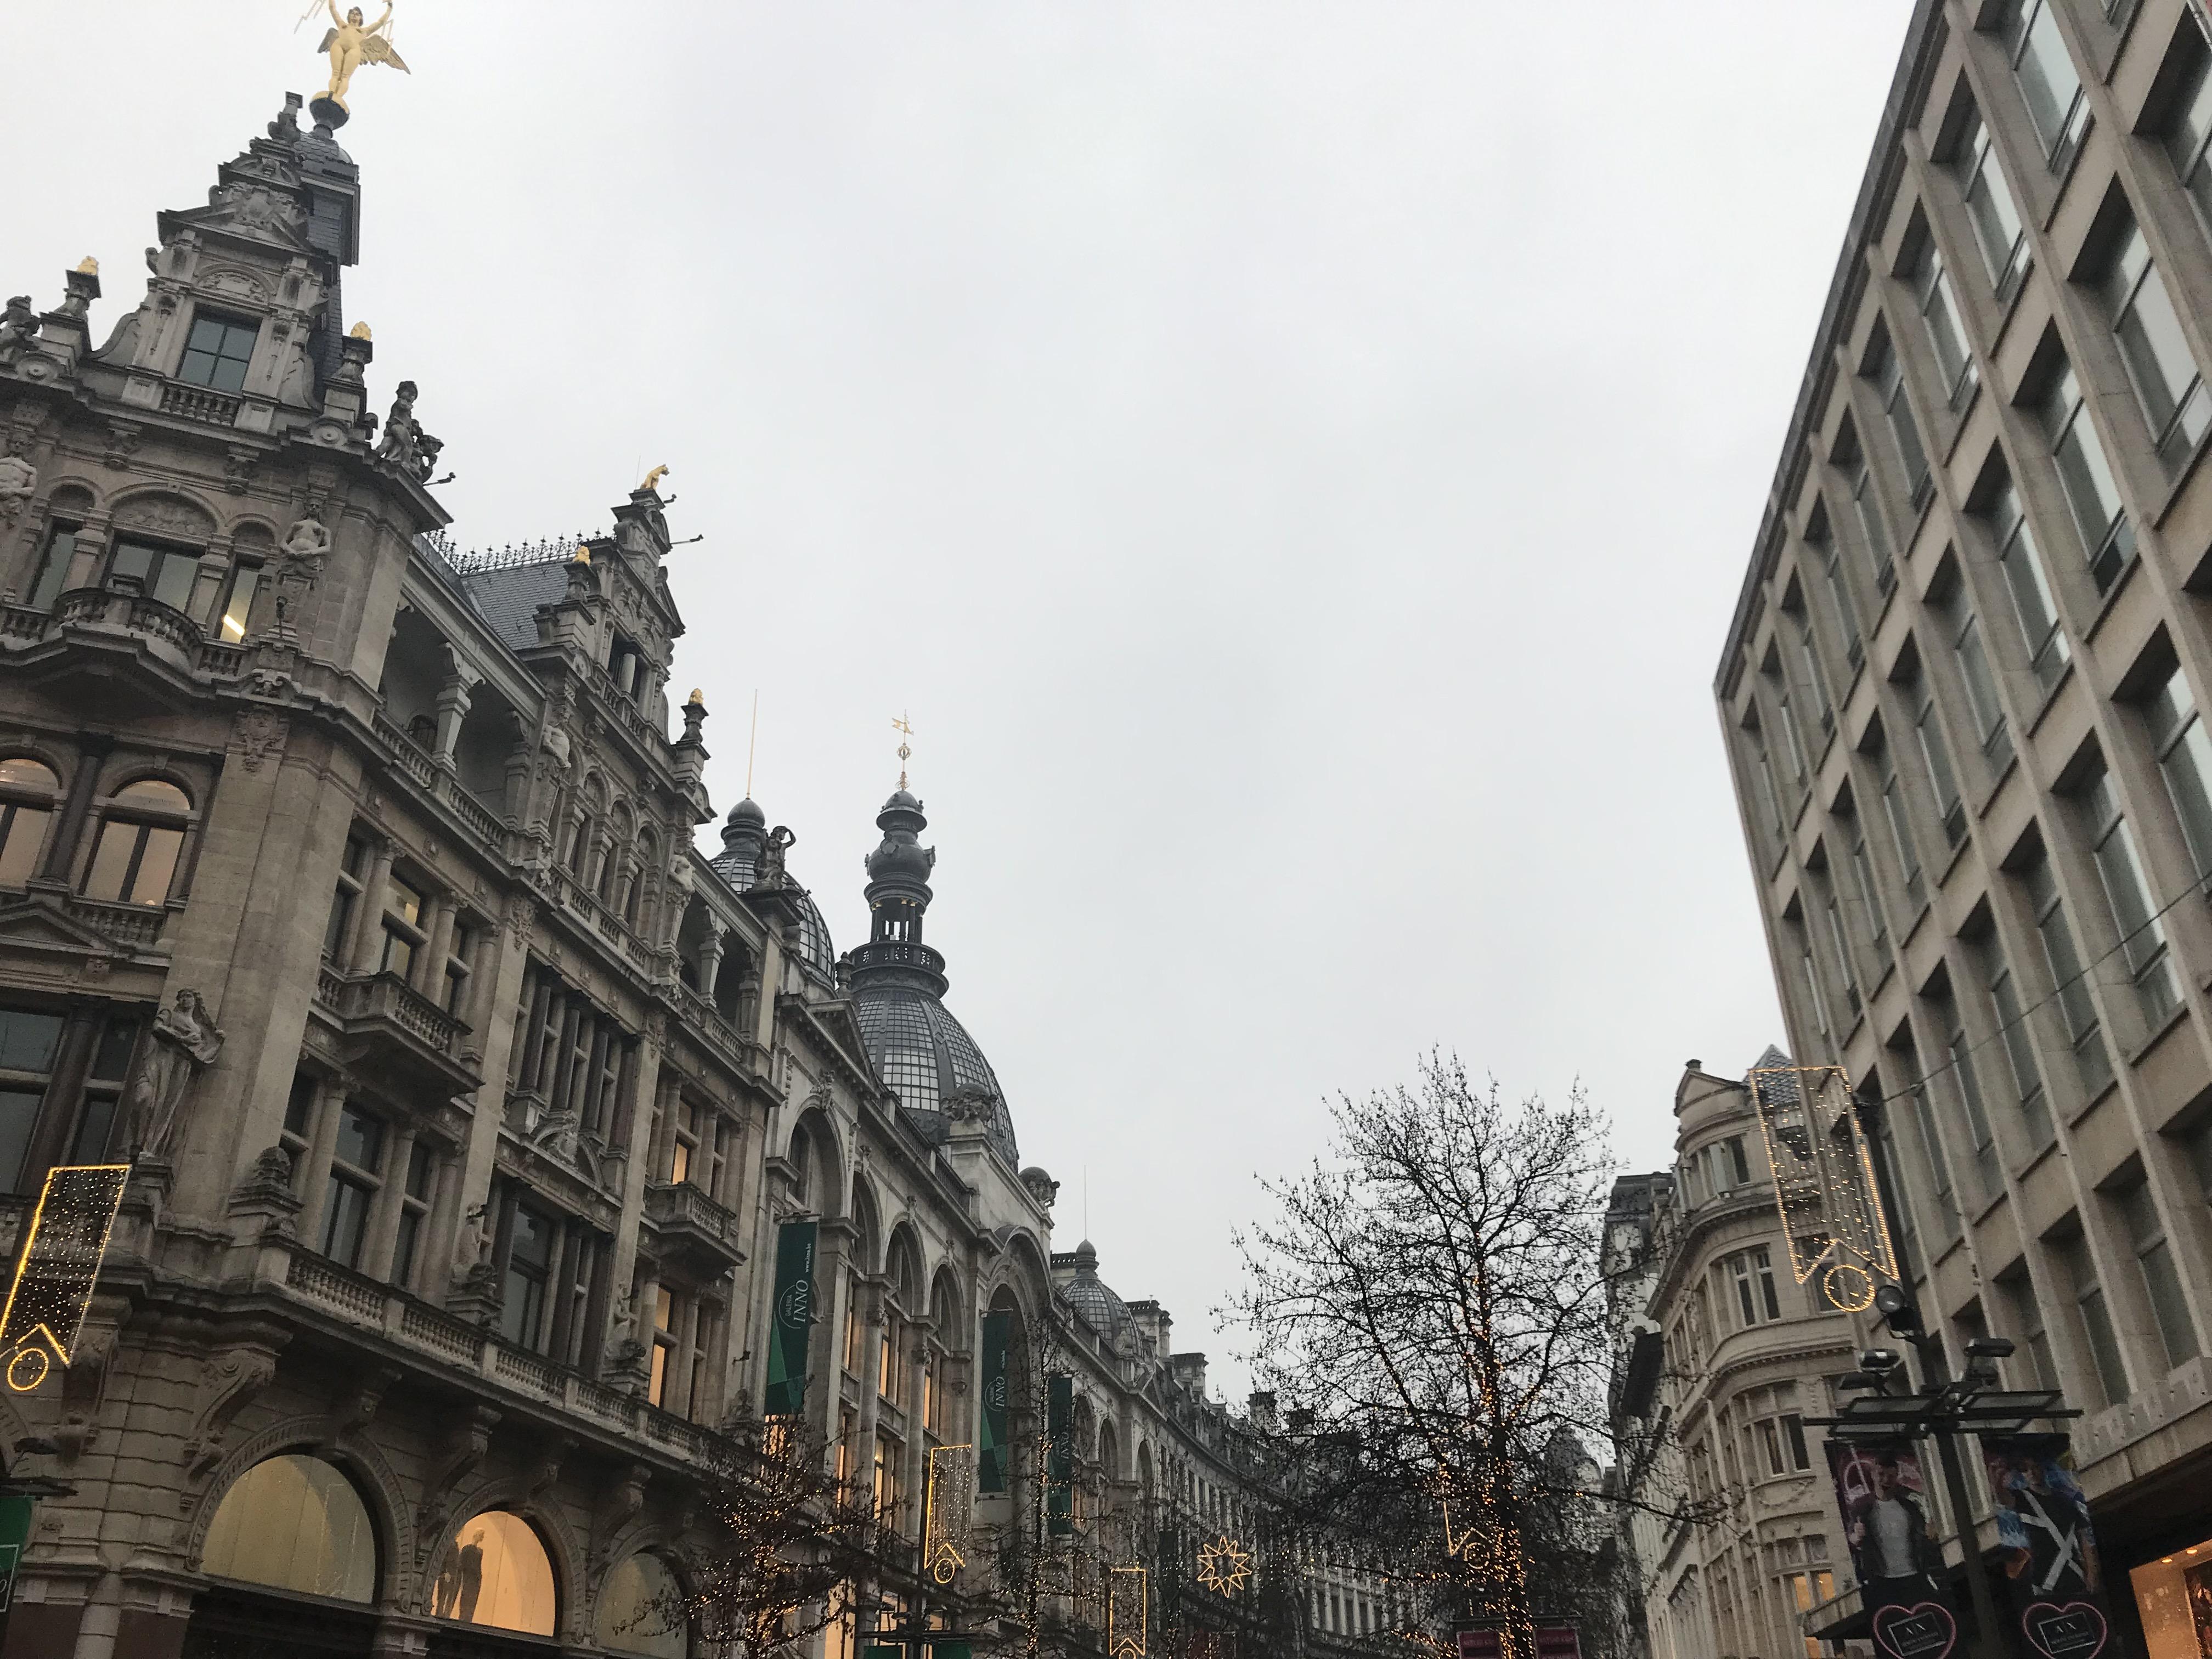 Ronddwalen in Antwerpen